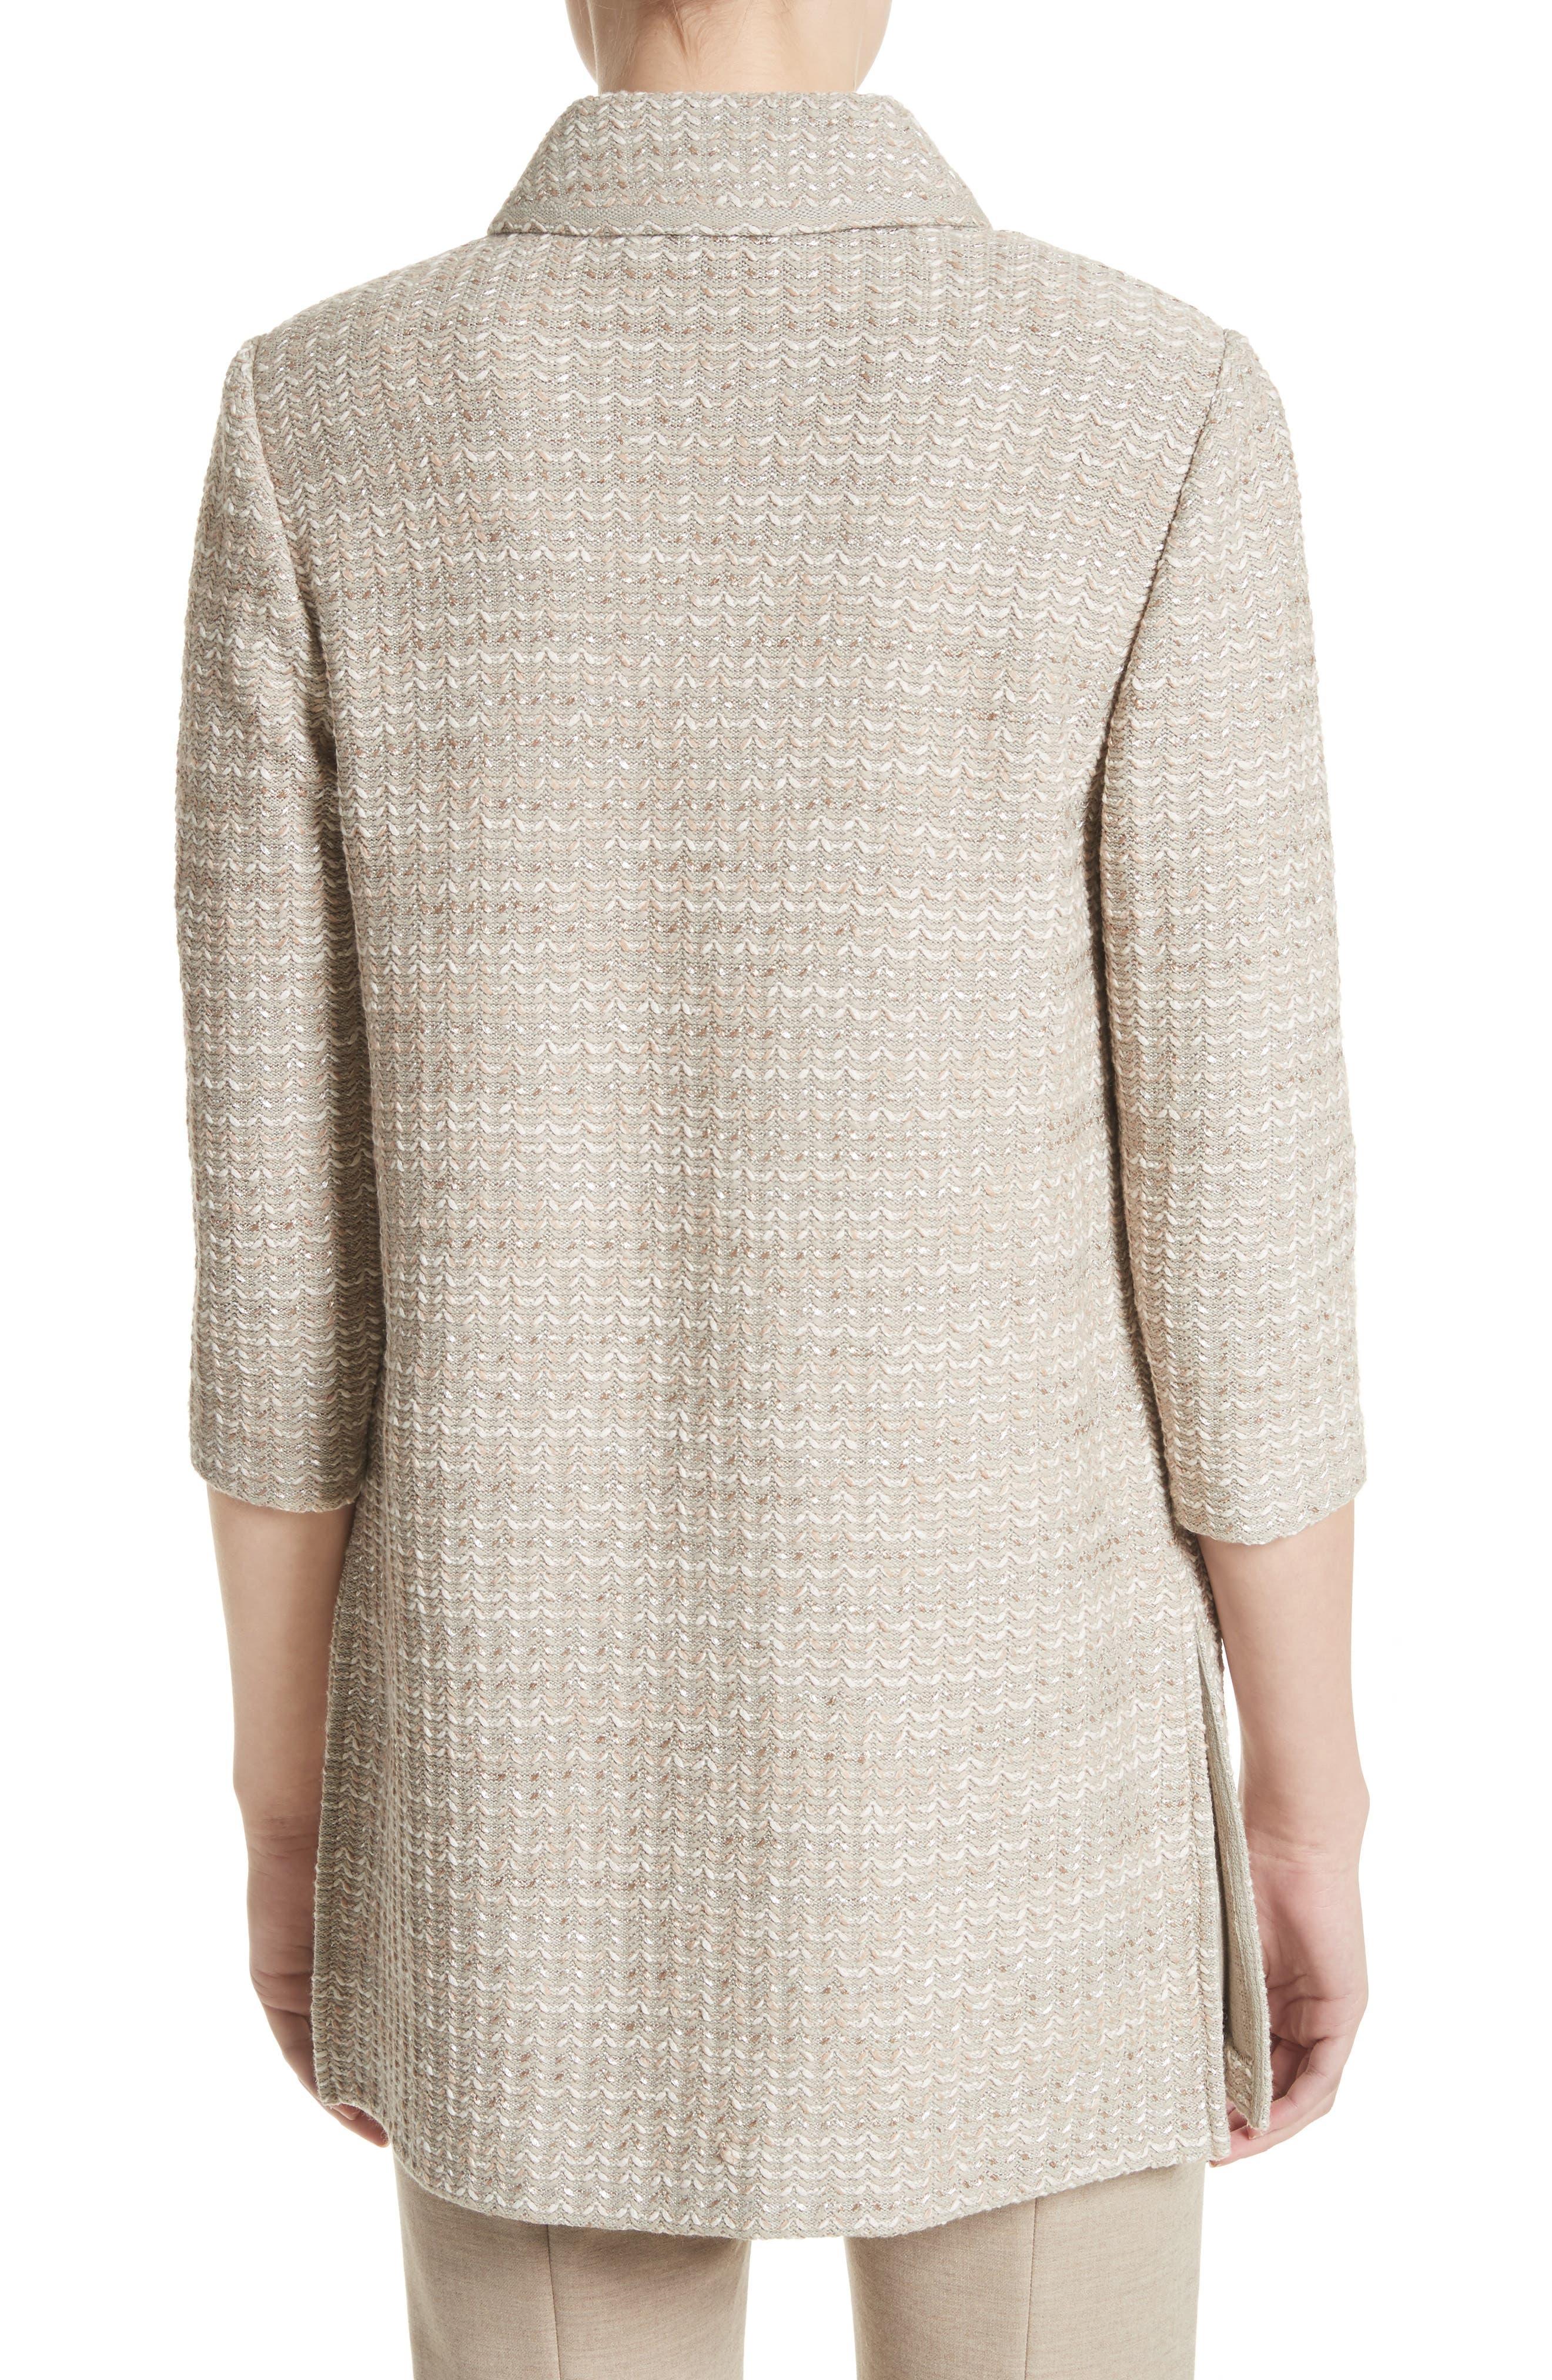 Alternate Image 2  - St. John Collection Chevron Knit Shantung Jacket